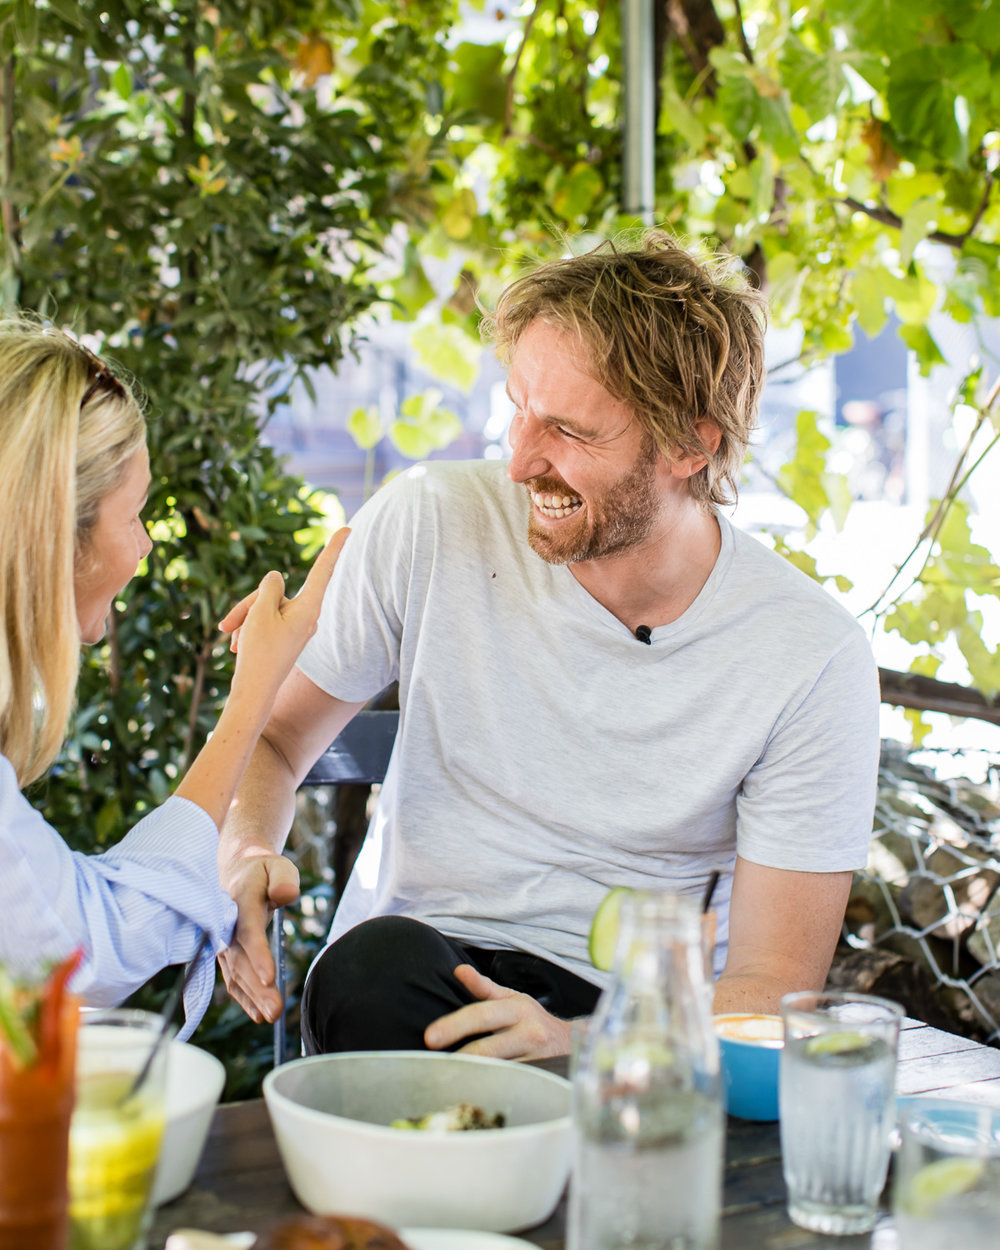 Magdalena Roze interviewing her husband Darren Robertson for The Pass.